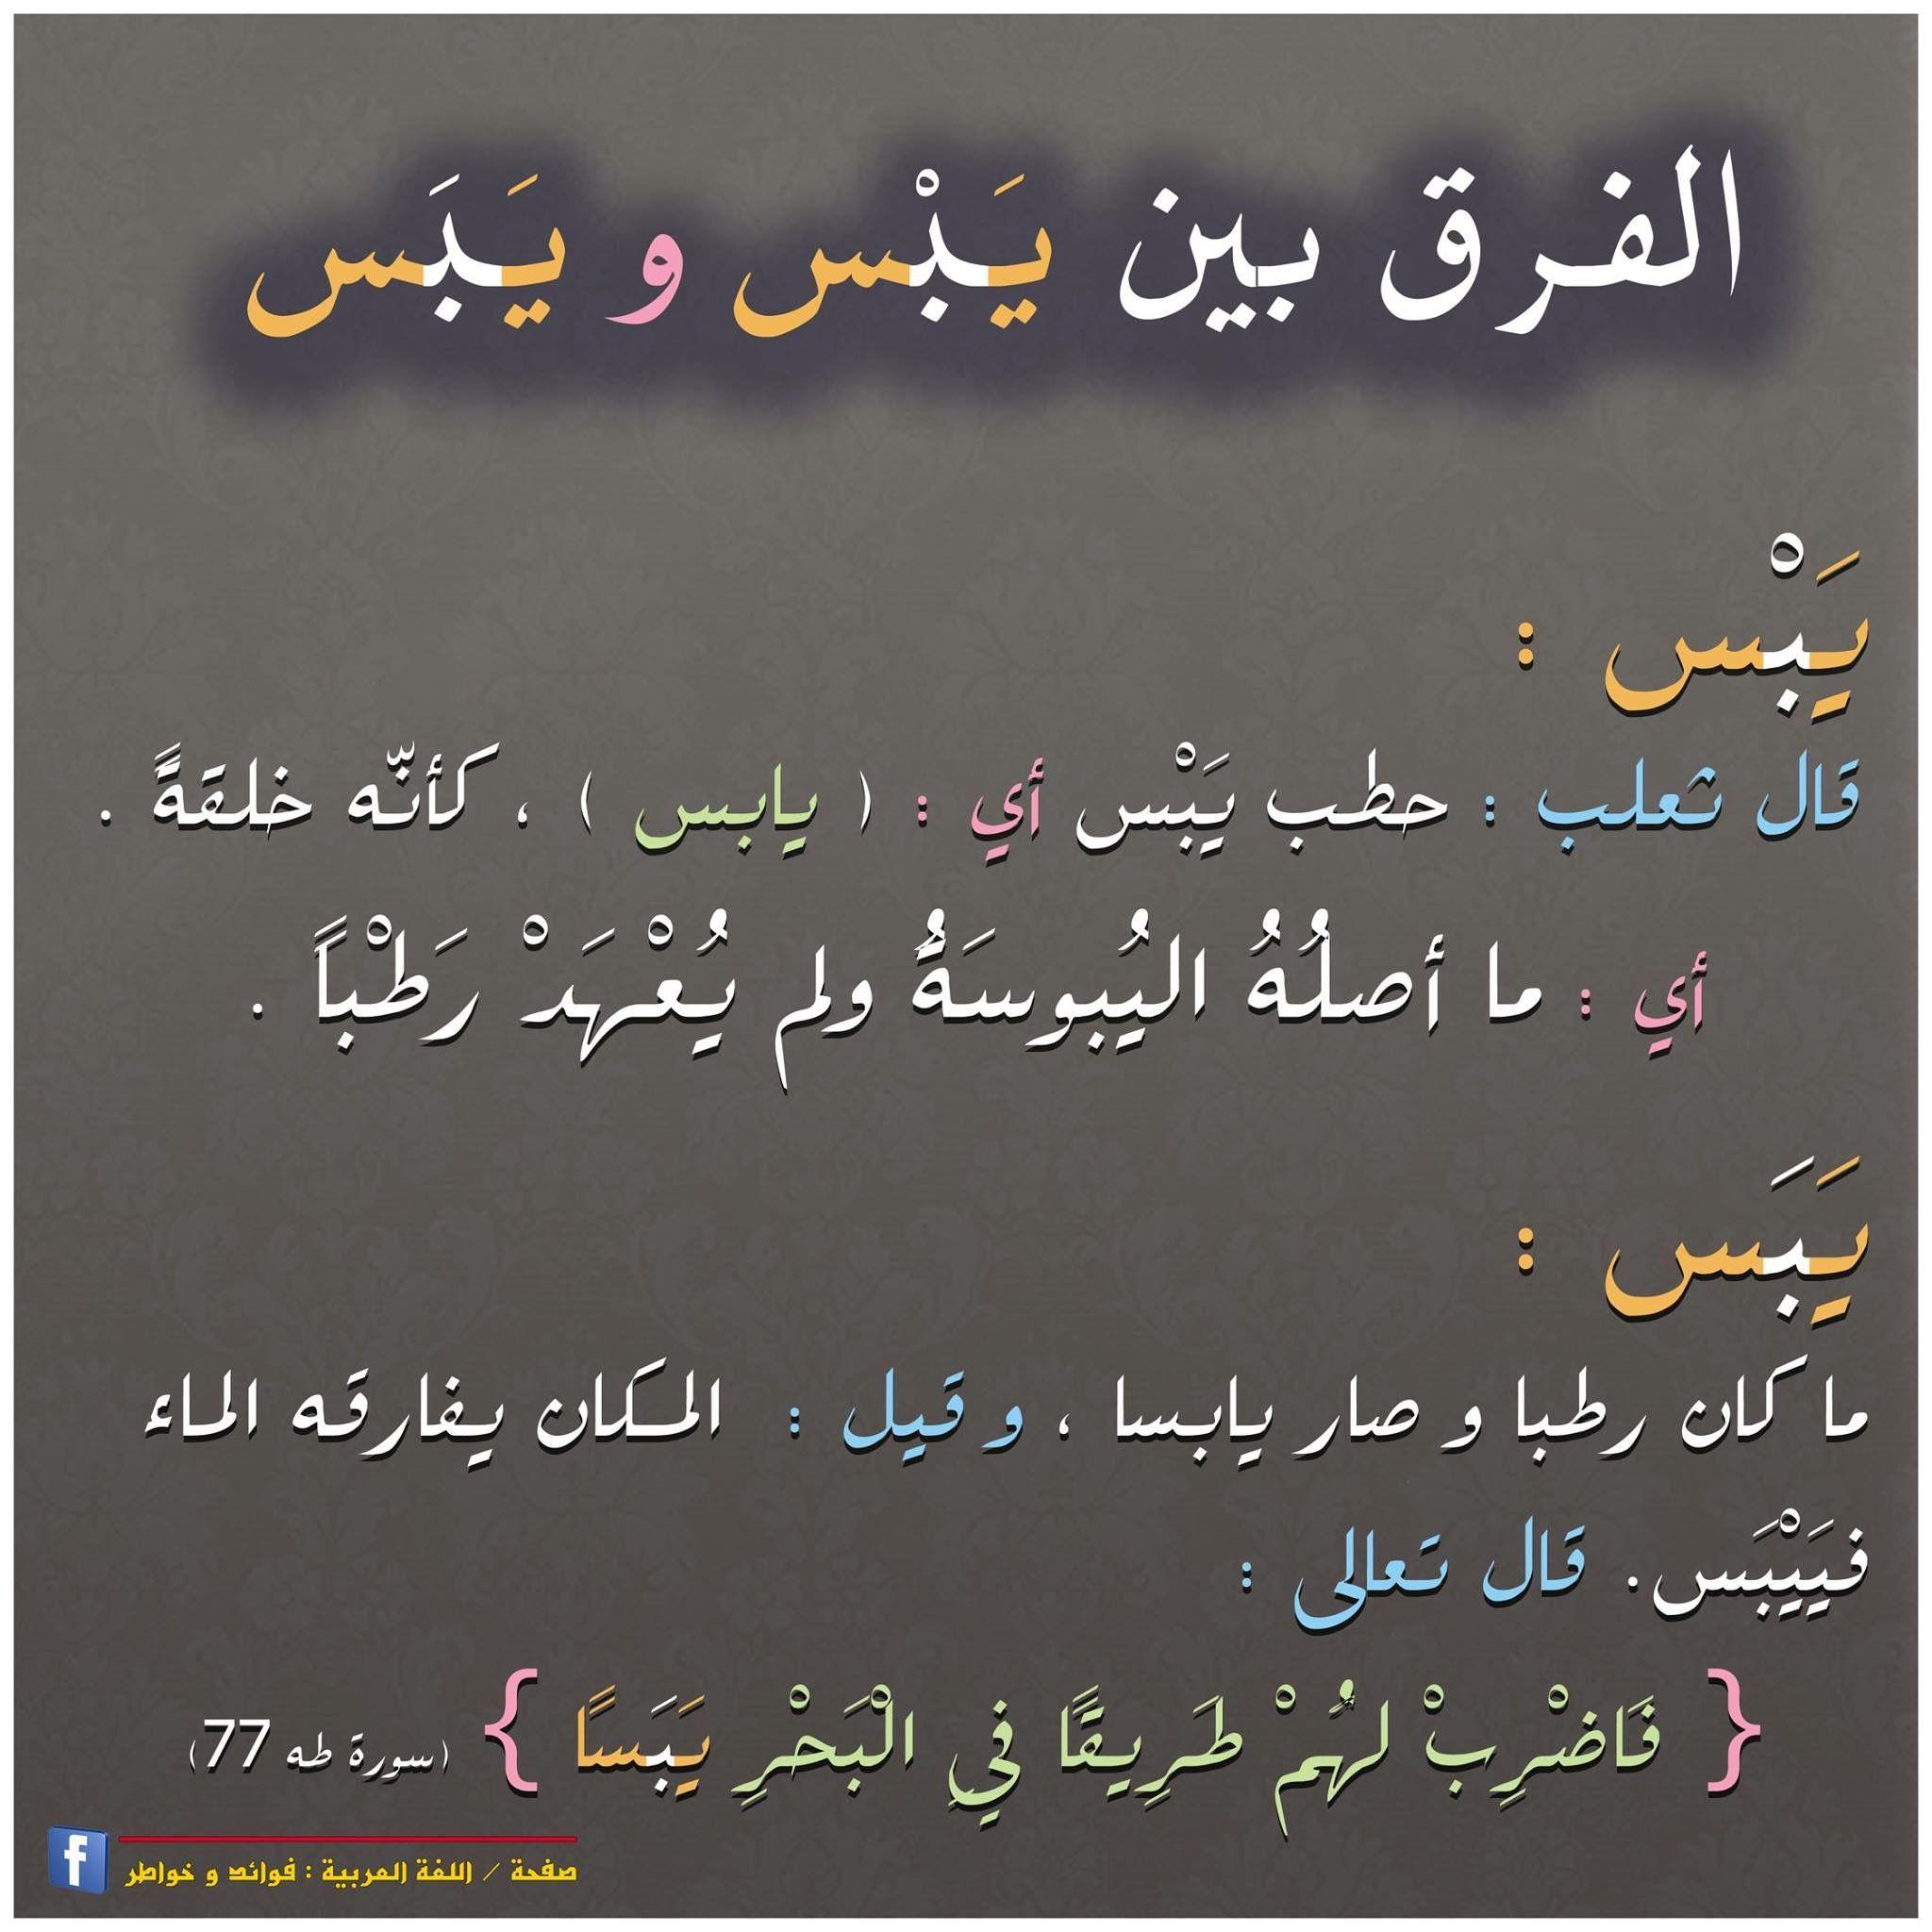 ي ب سا ٧٧ طه Learning Arabic Learn Arabic Language Arabic Language